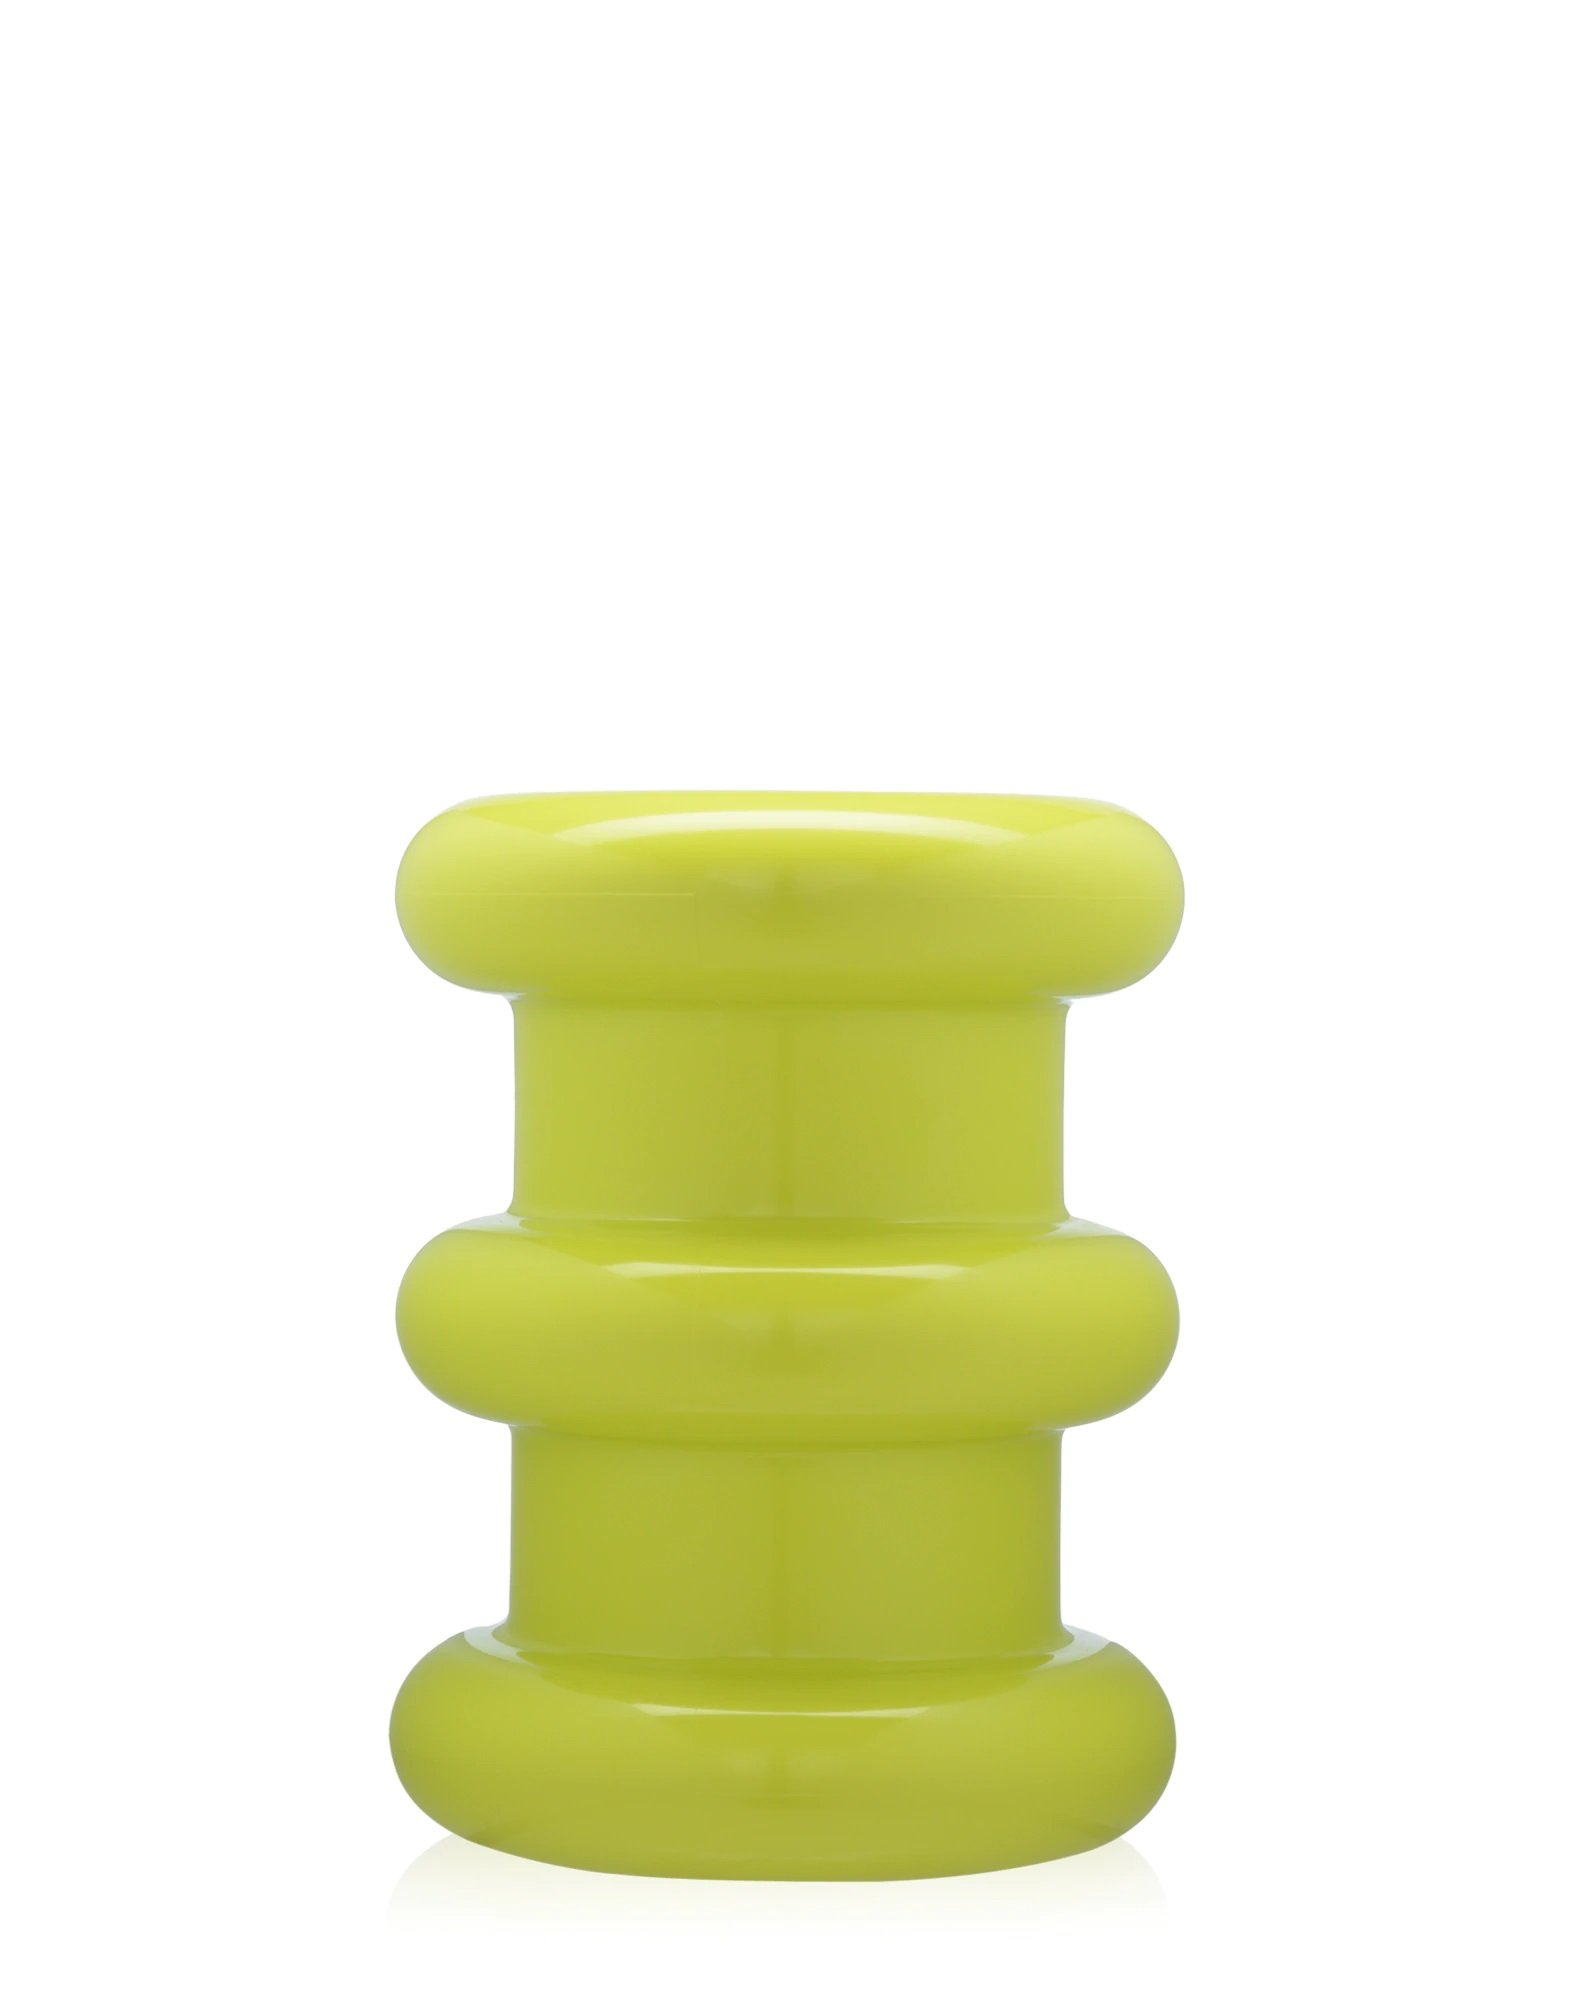 Pilastro Stool  from Kartell, designed by Ettore Sottsass